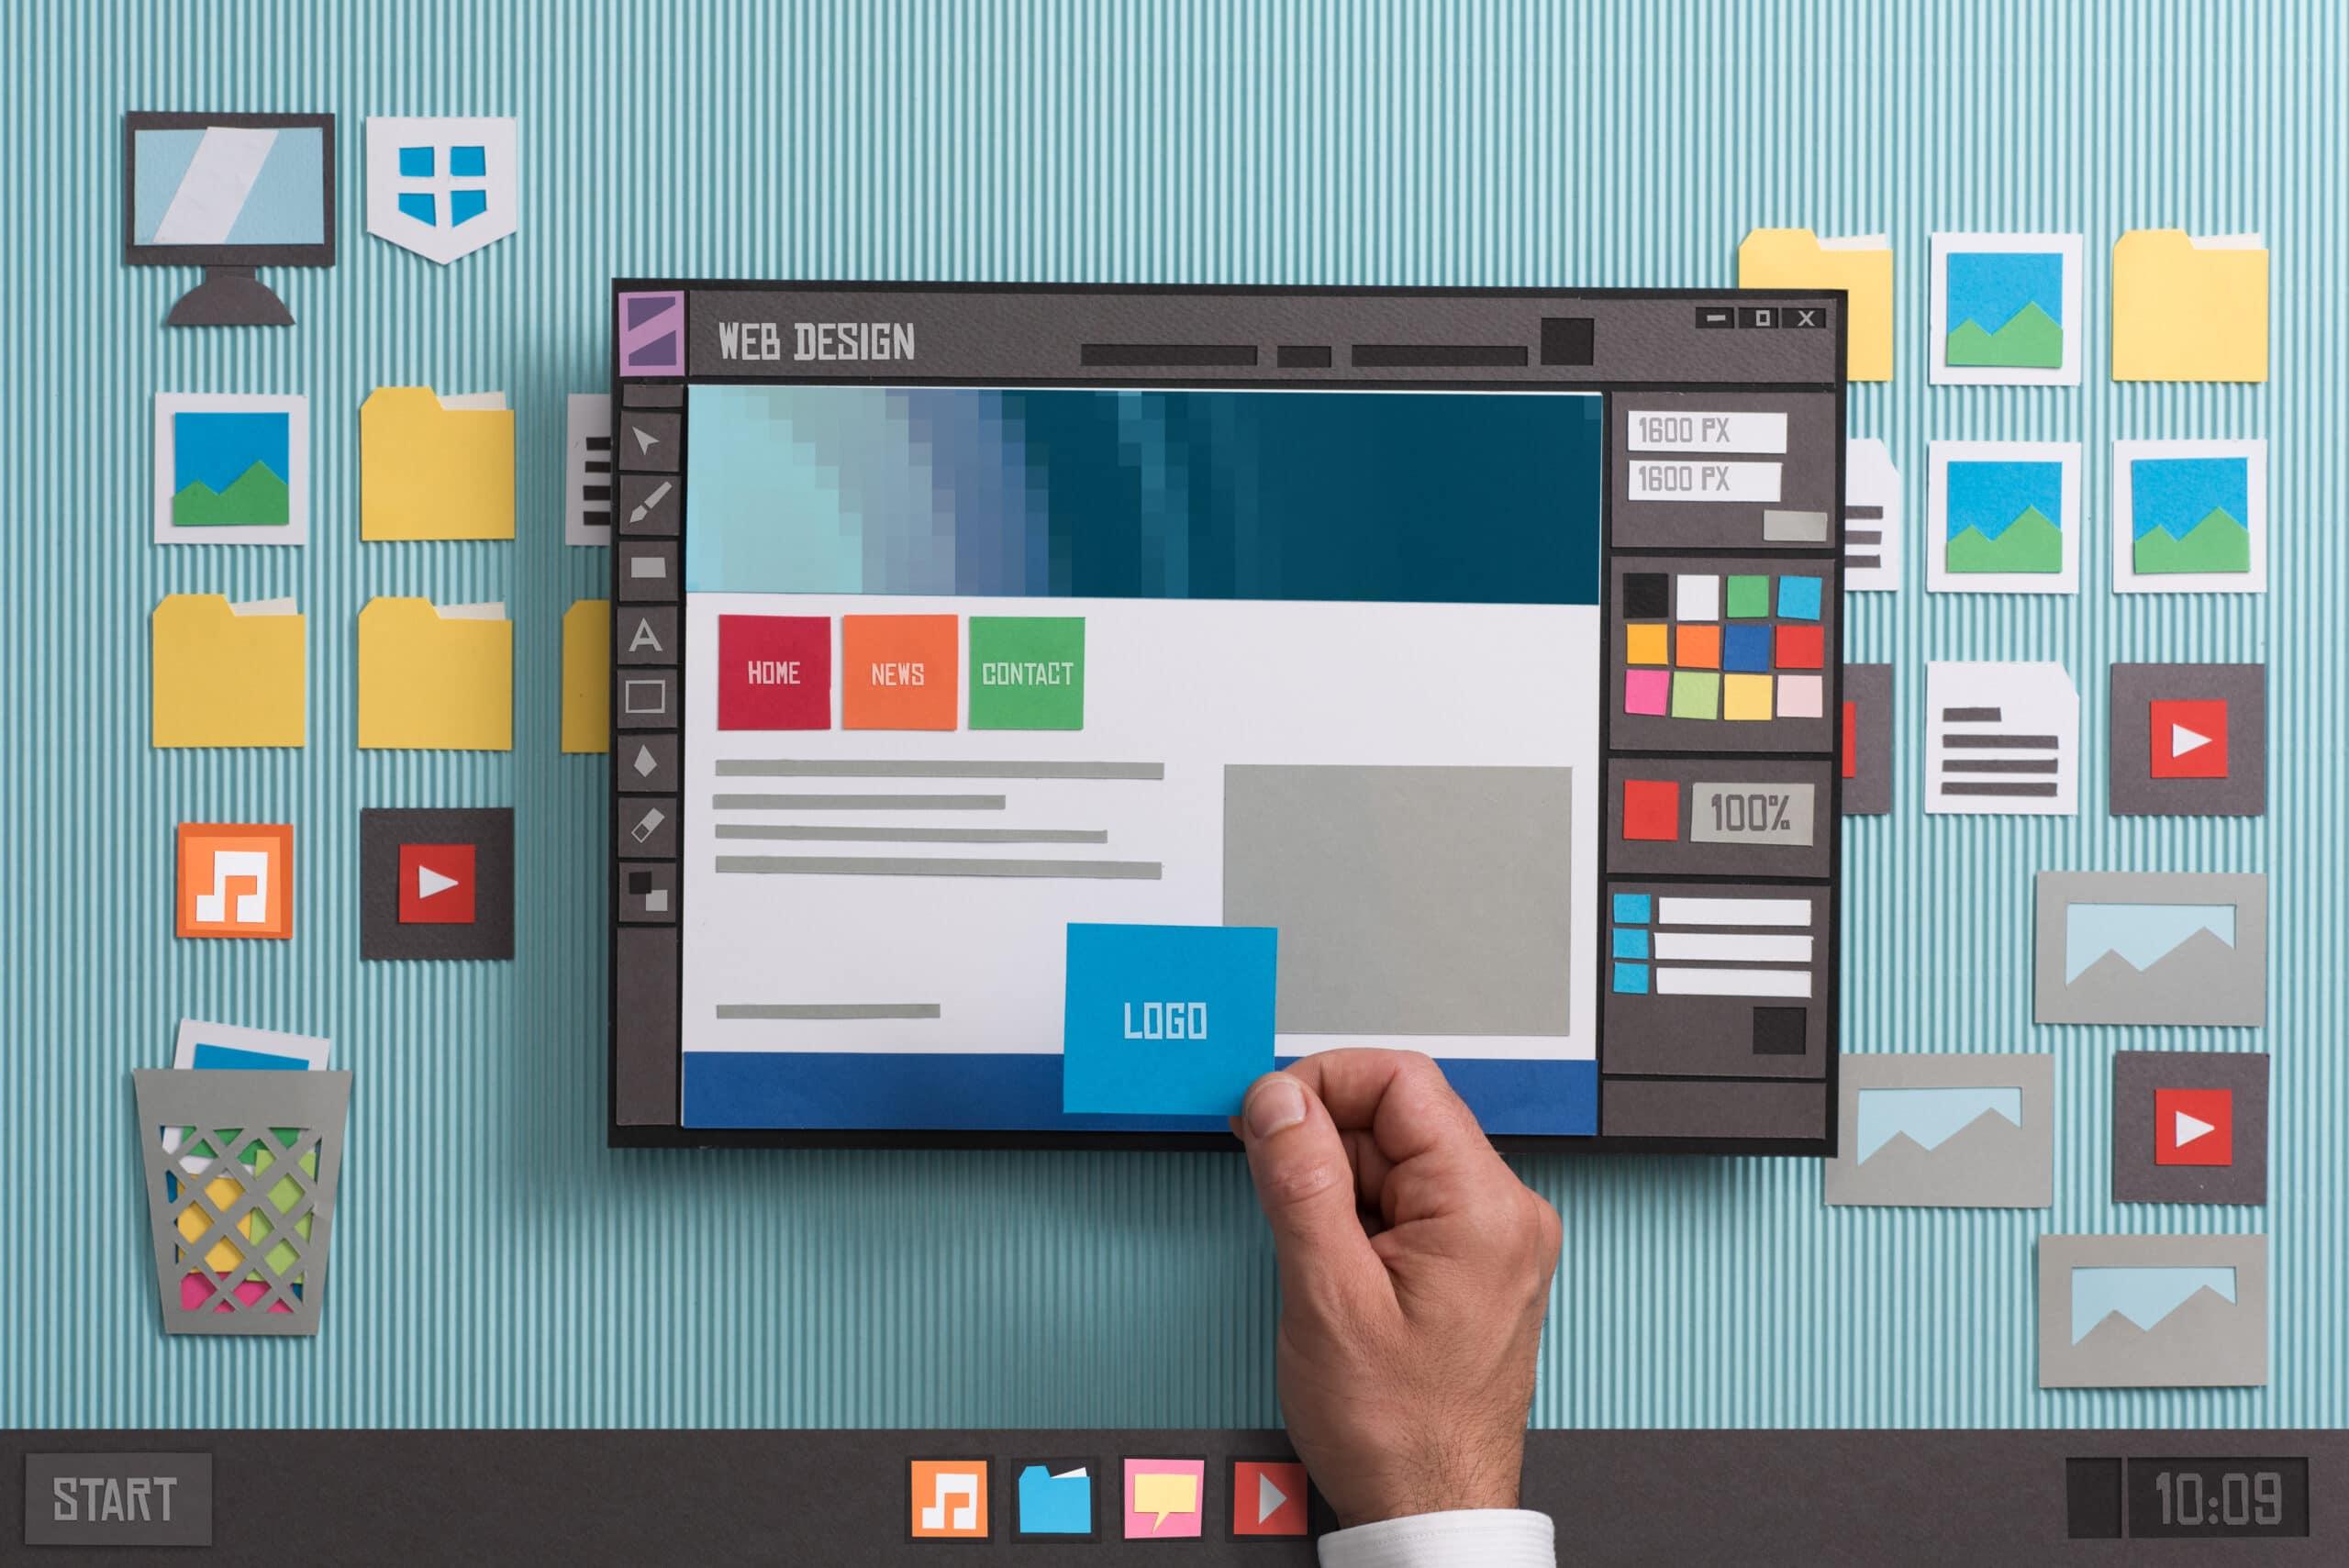 graphical representation of website design